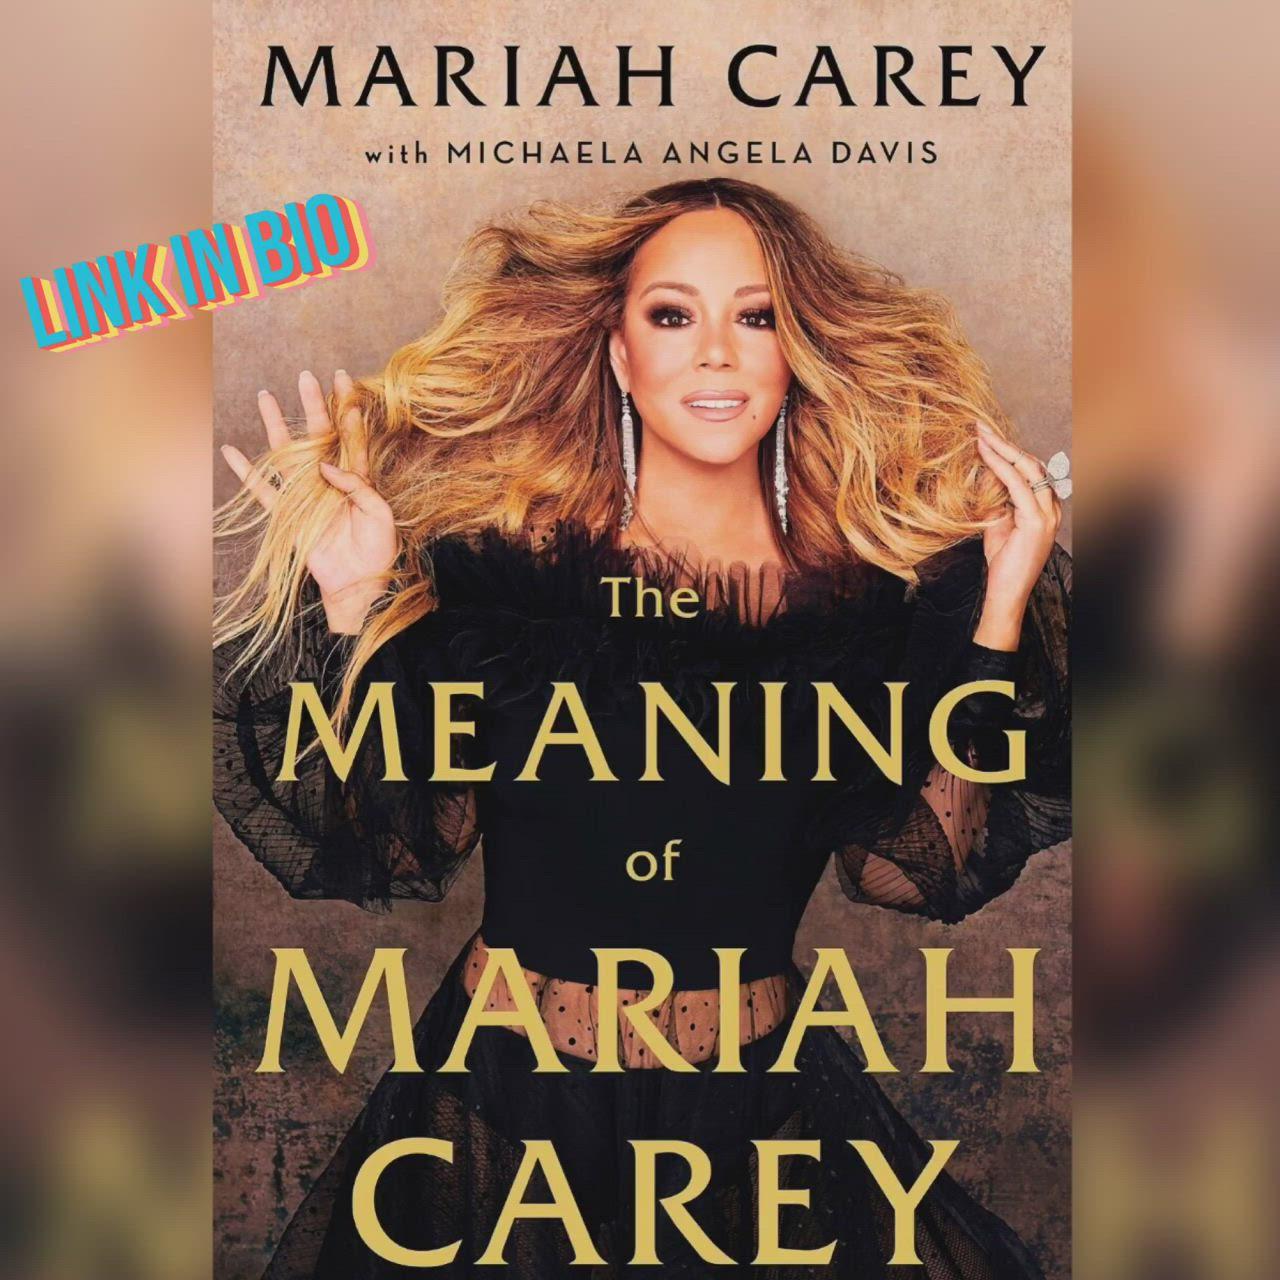 The Meaning Of Mariah Carey Inspire Me Jcoulterj Video Mariah Carey Good Books Mariah